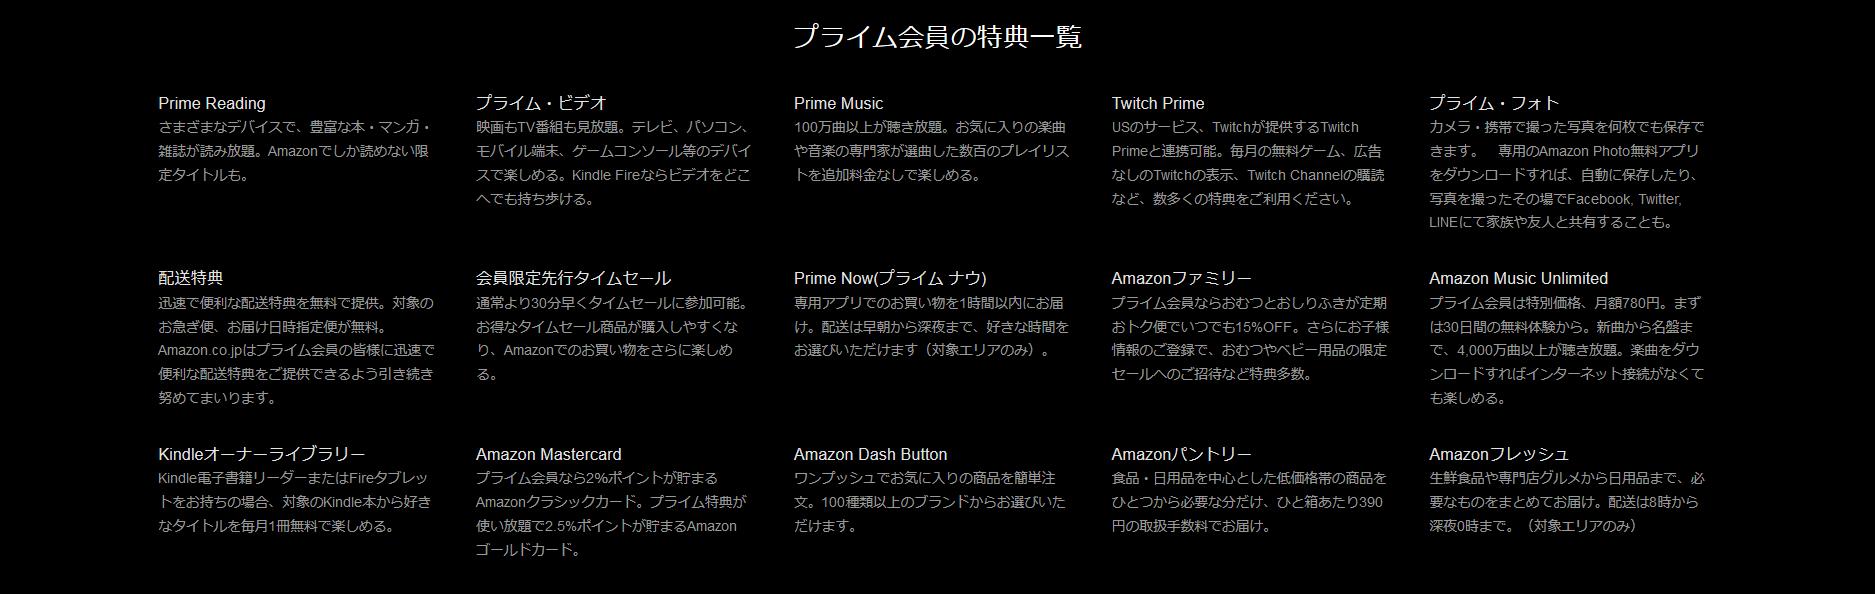 Screenshot-2018-1-20 Amazon co jp Amazon Prime